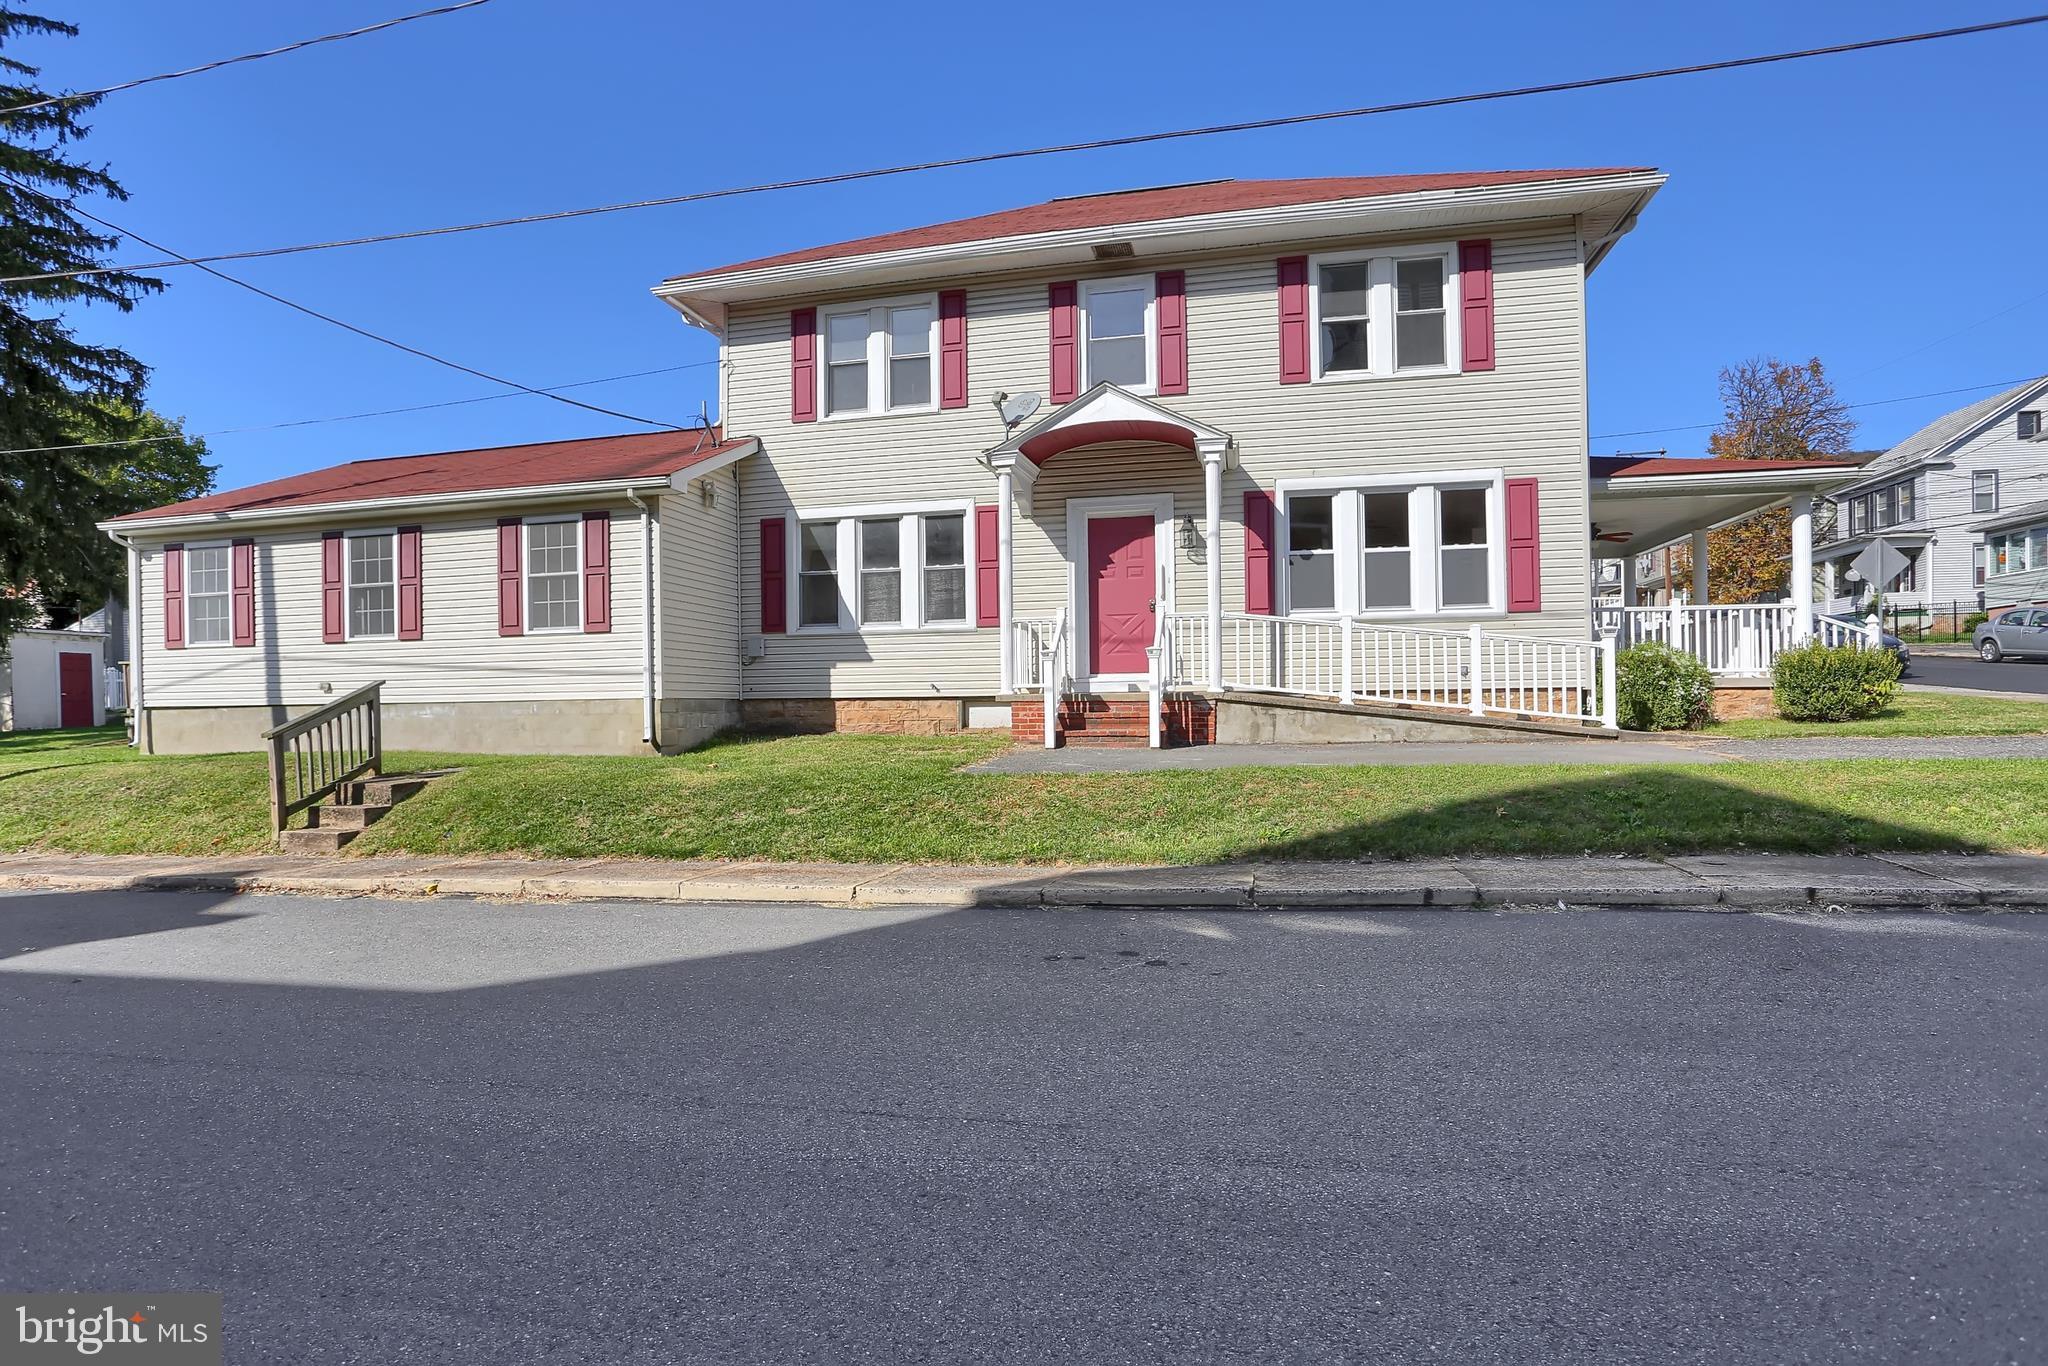 200 EAST STREET, WILLIAMSTOWN, PA 17098